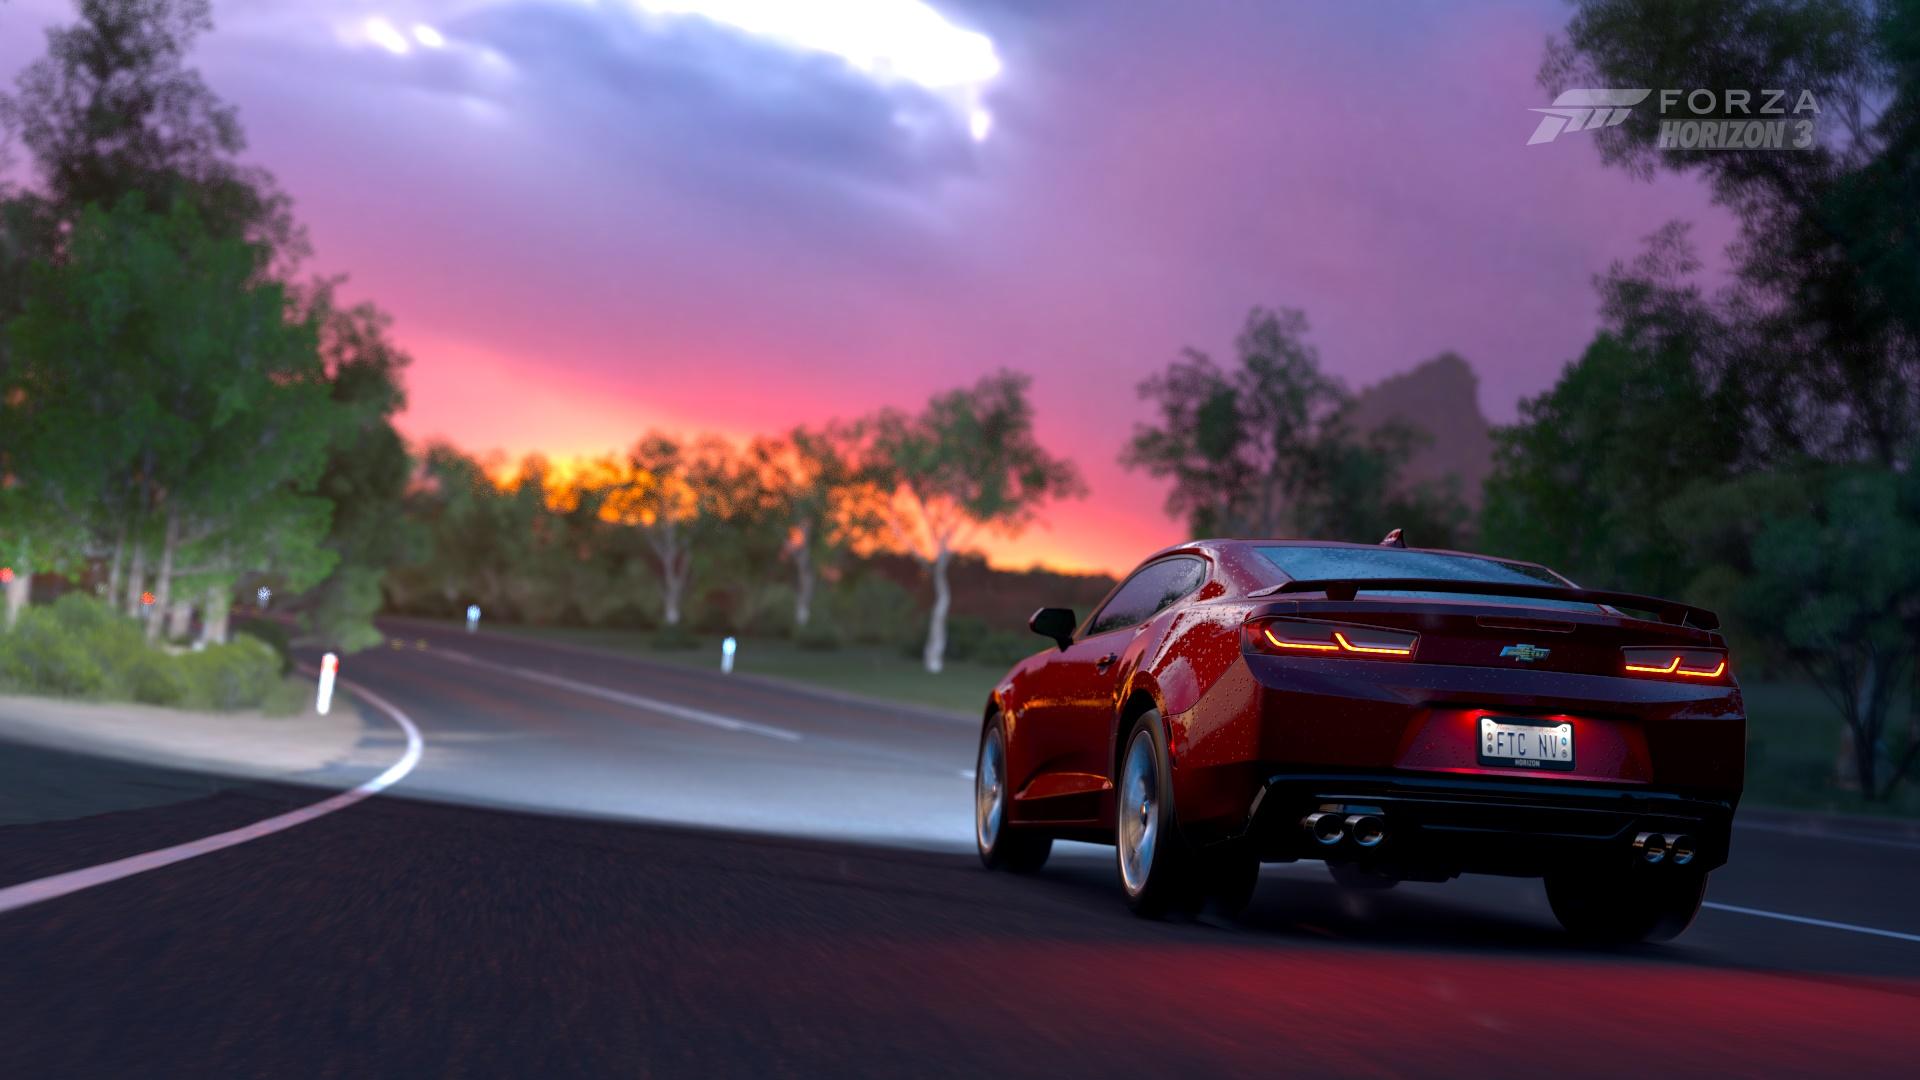 Forza Horizon 3 Wallpaper Engine